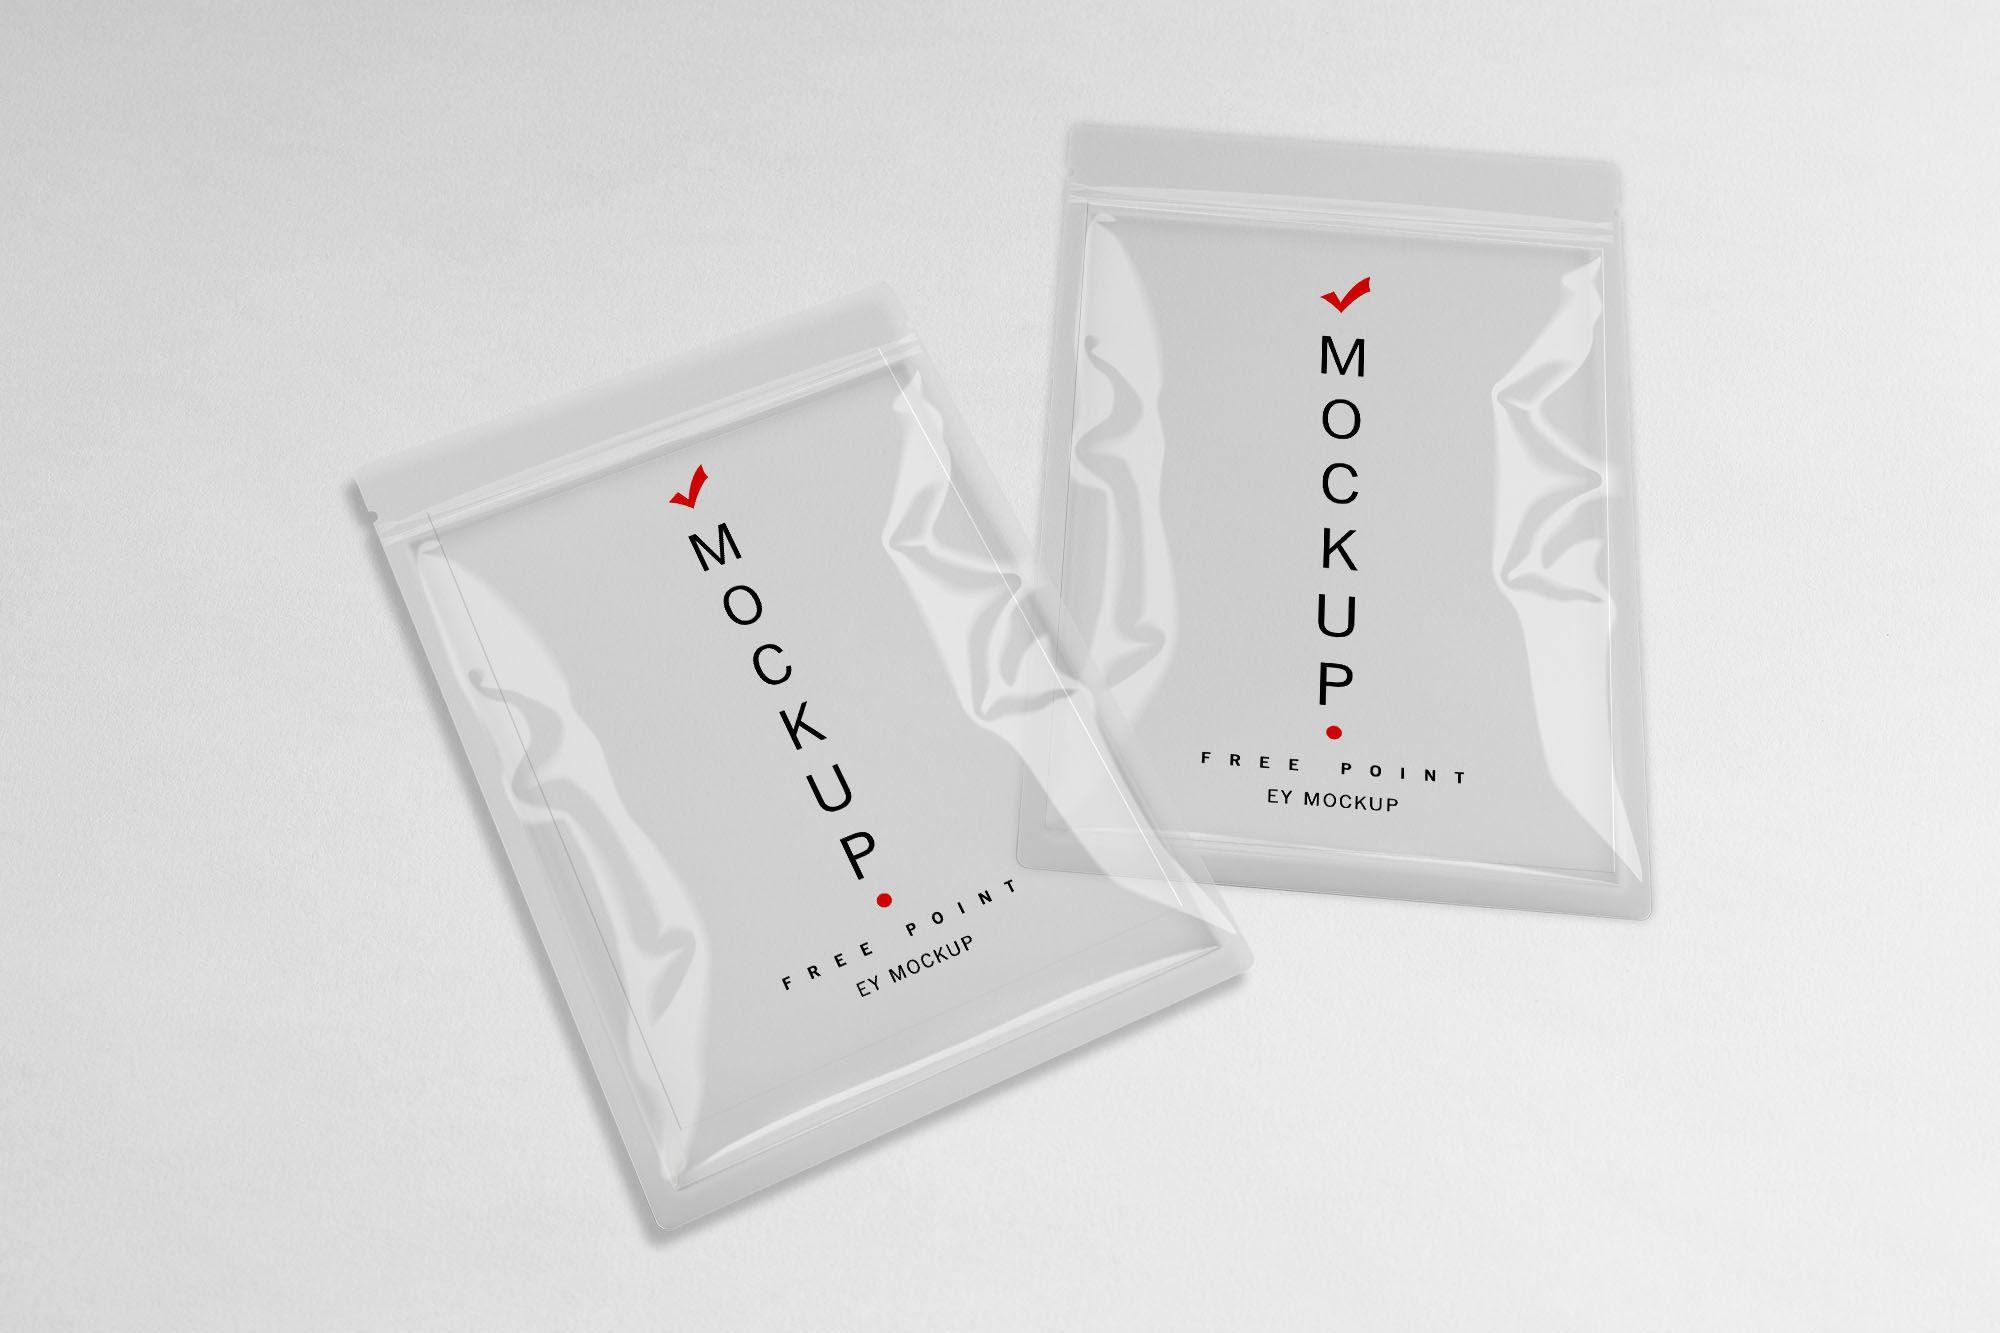 Download Free Clear Pepper Sachet Psd Label Mockup Design Downloadfree Downloadpsd Freelabel Labelmockup Mock Up Mockup Free Psd Free Mockup Logo Design Mockup